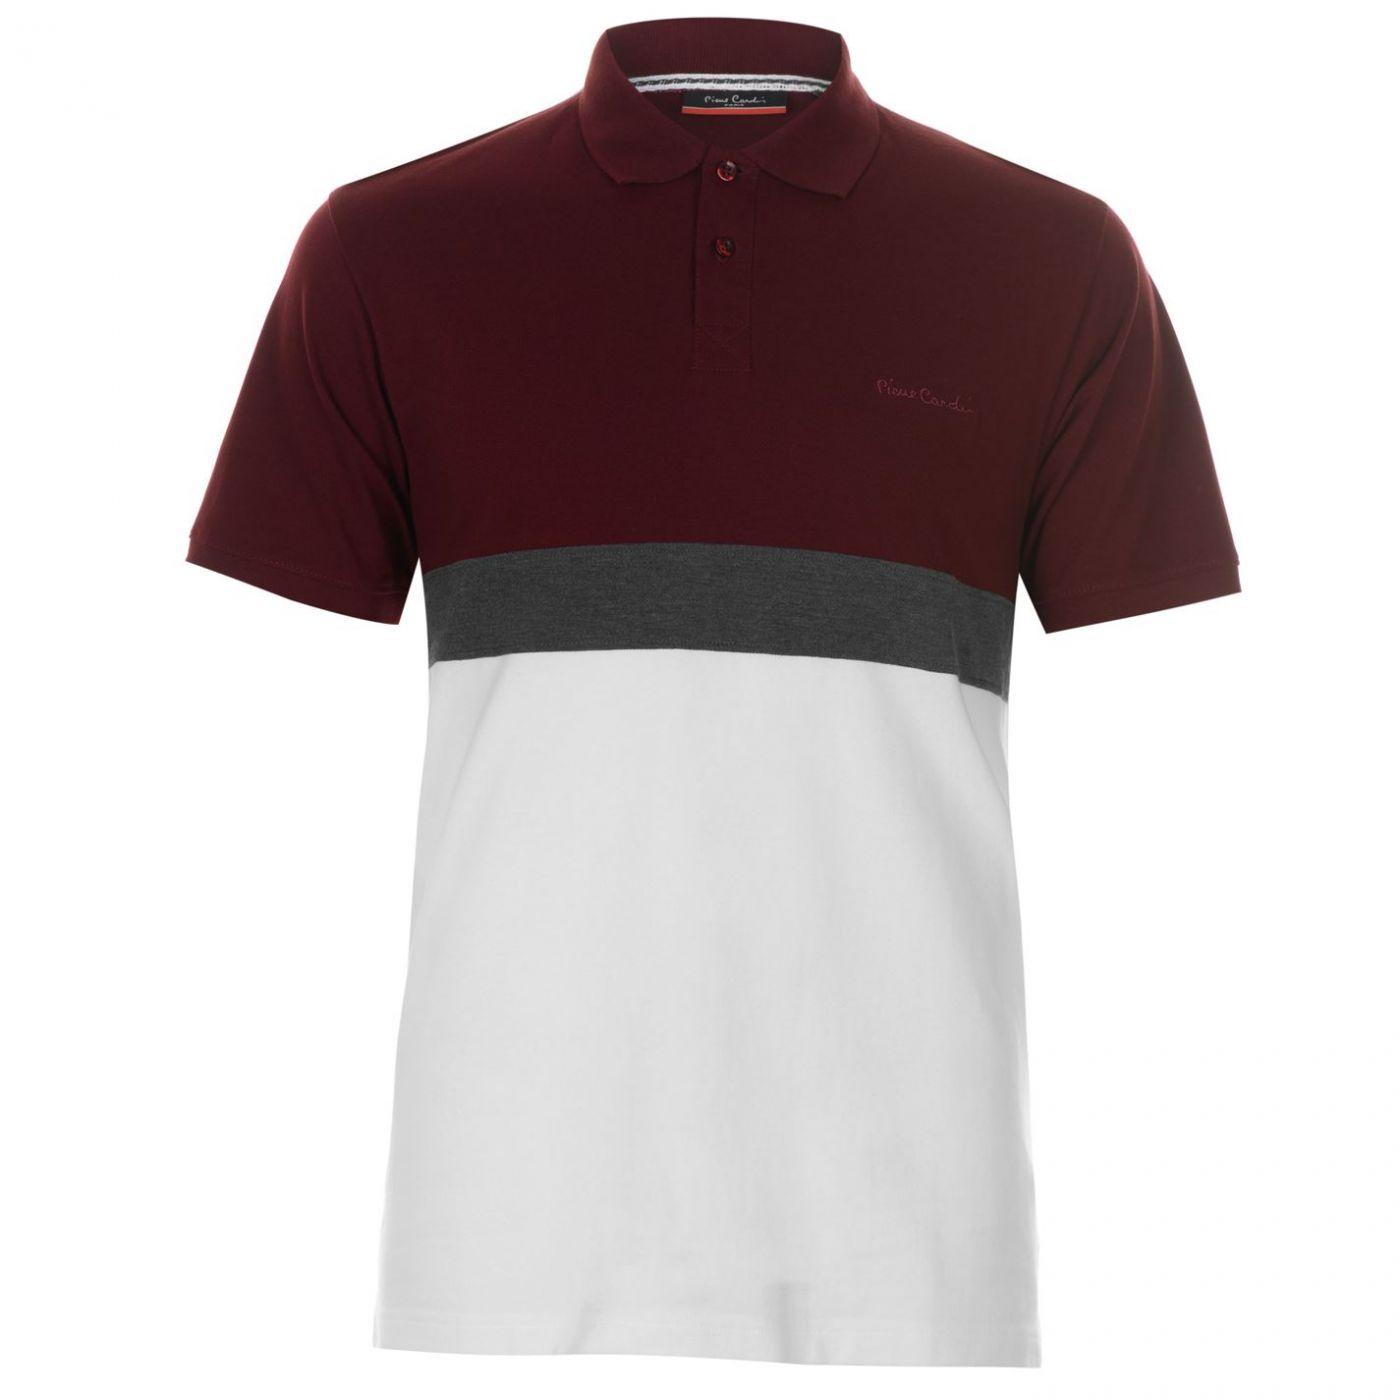 Pierre Cardin Polo Shirt Mens